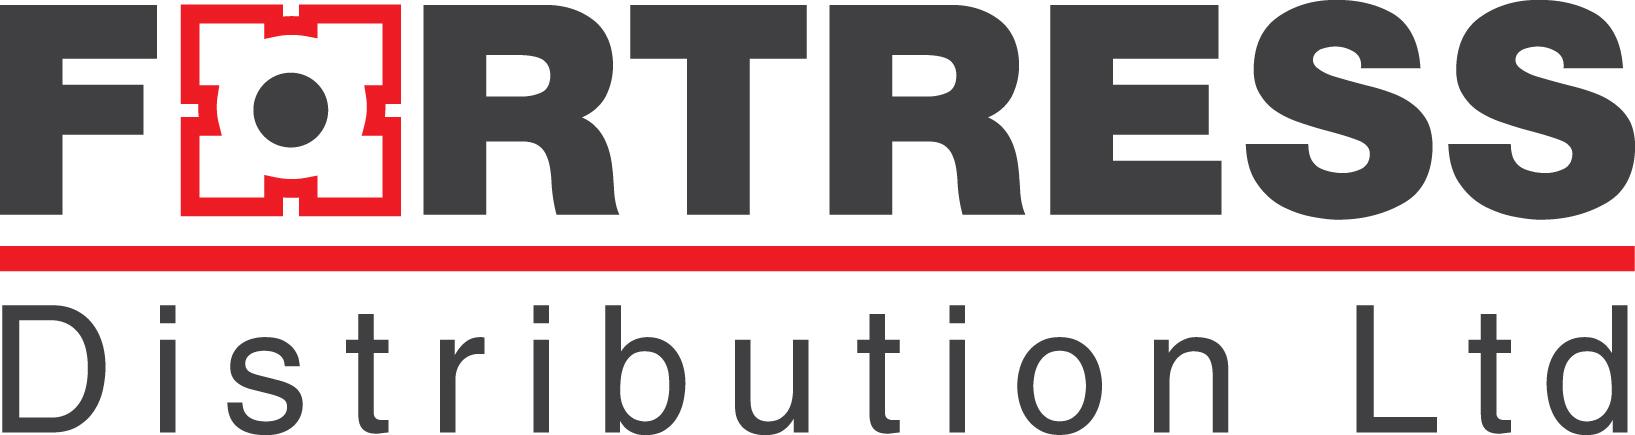 FORTRESS DISTRIBUTION LTD_Logo Variations FINAL